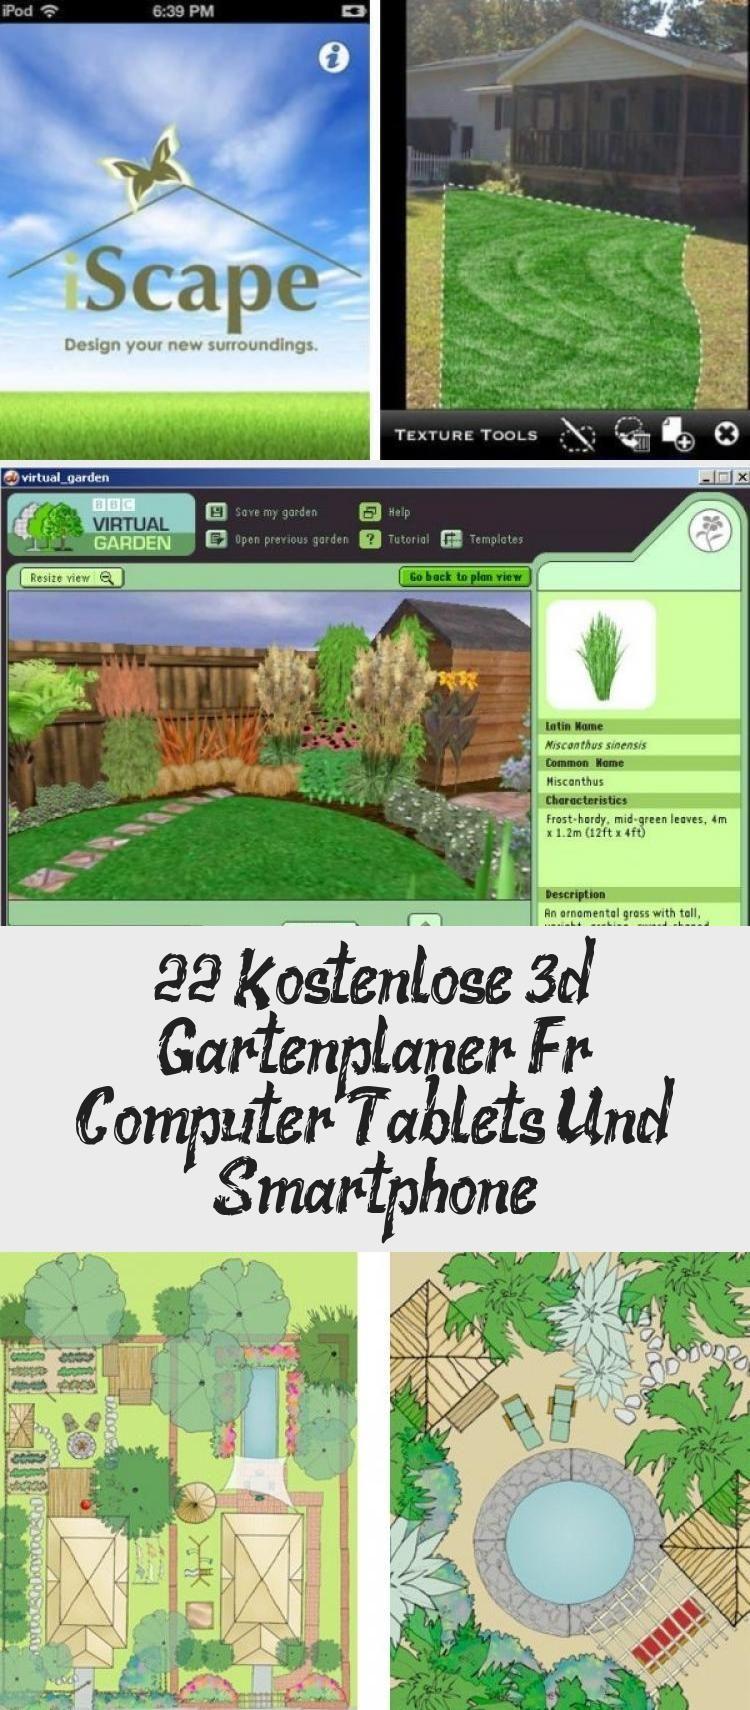 Planer Landschaftsbau Online Software Mein Schoener Garten Planungstool Gartenplanungkinder Gartenplanungskizze Gartenplanun In 2020 Garden Help Scape Texture Tools